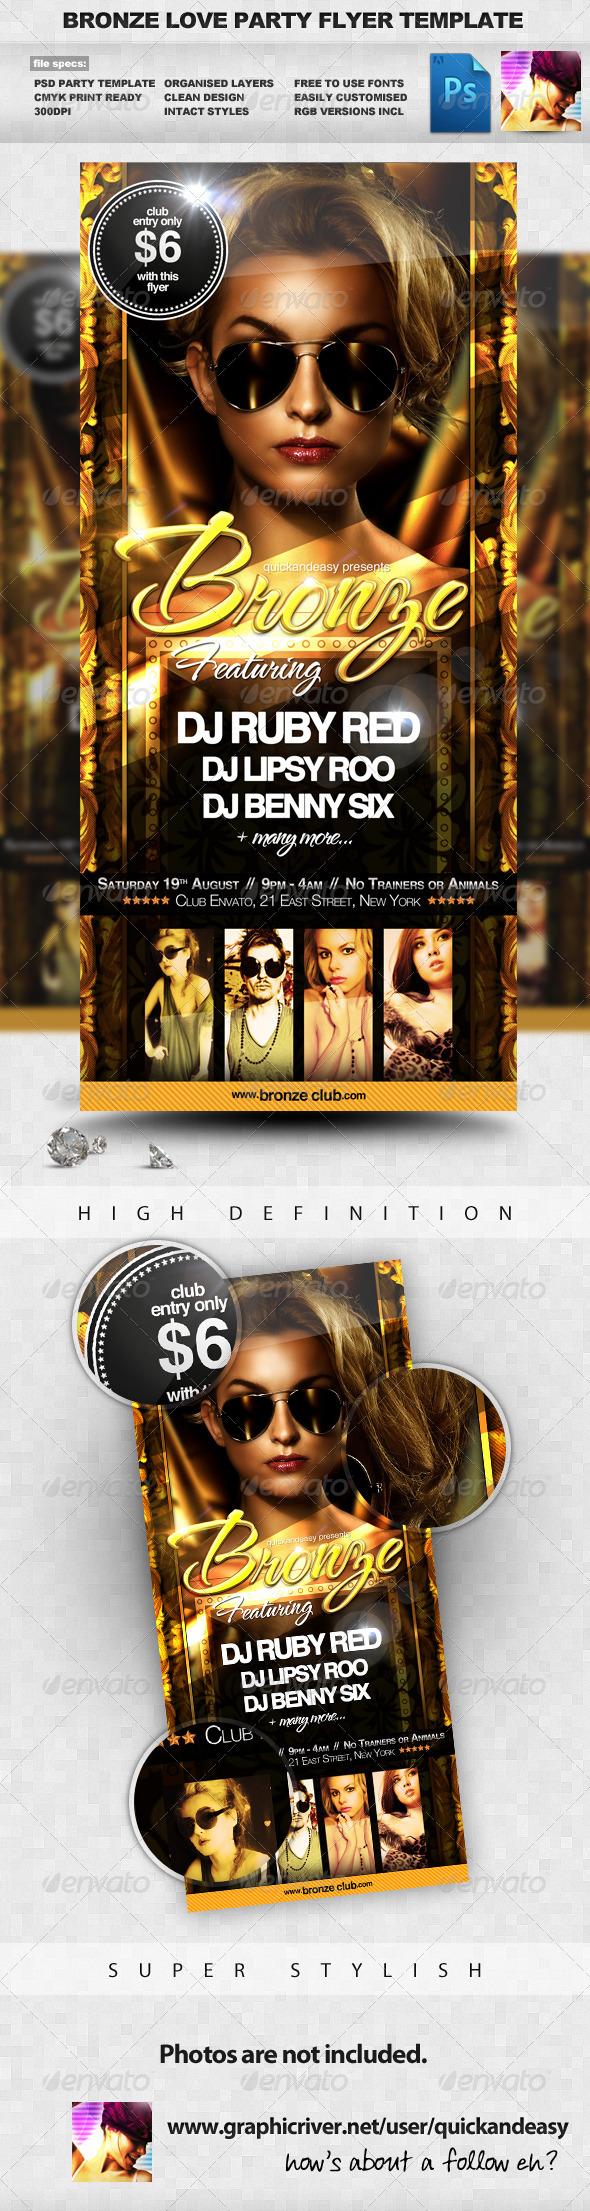 http://3.s3.envato.com/files/26367213/bronze-love-flyer-template.jpg